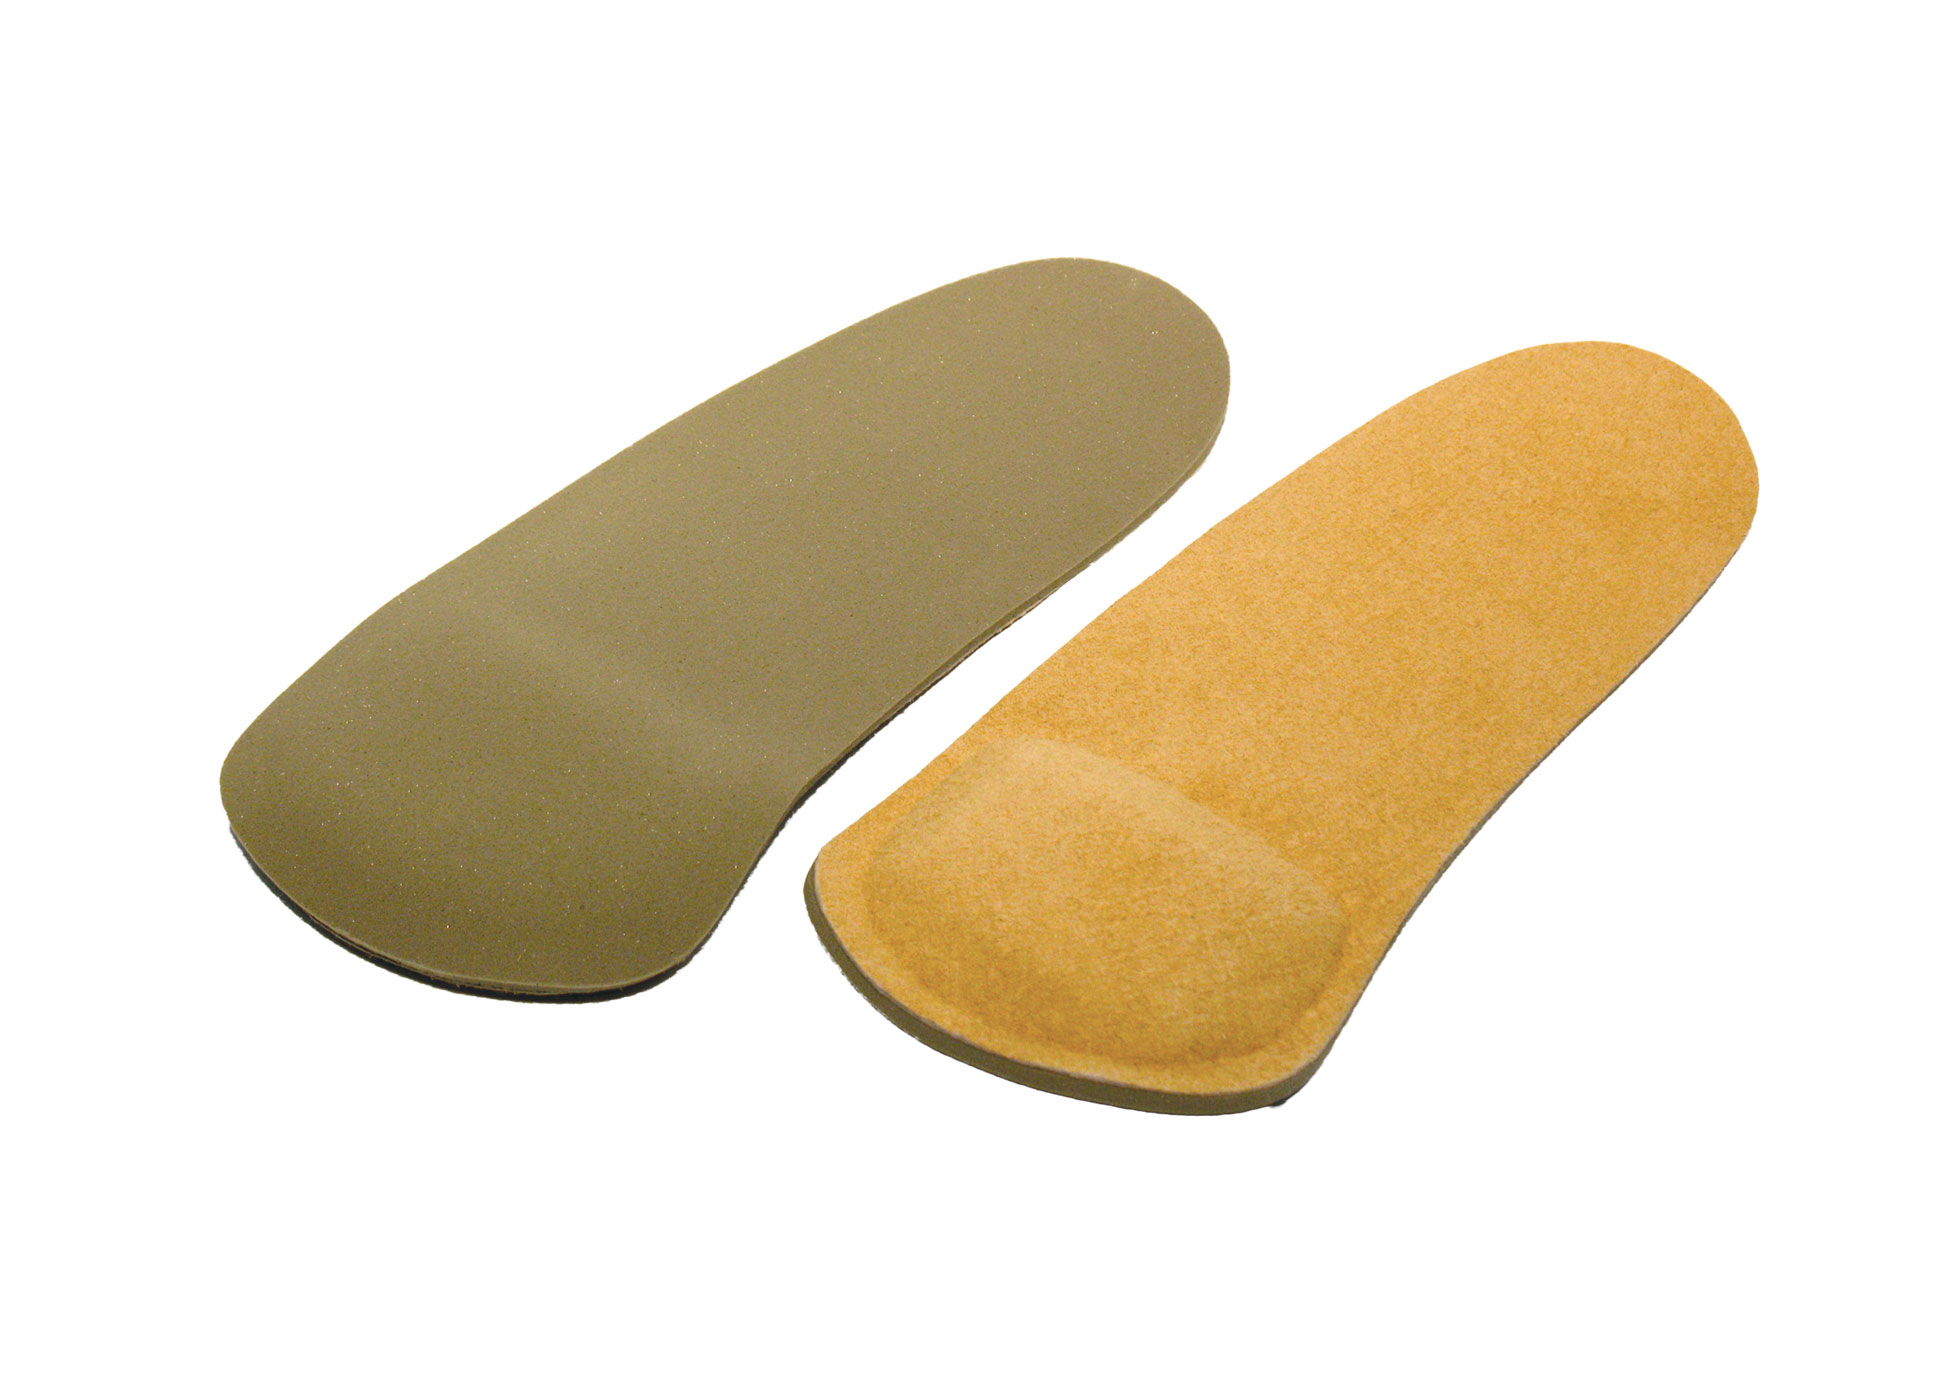 Haplabase Orthotic - Foot Supports - Model 406 - Per Pair - Metatarsal Pads - Womens 3 - 5